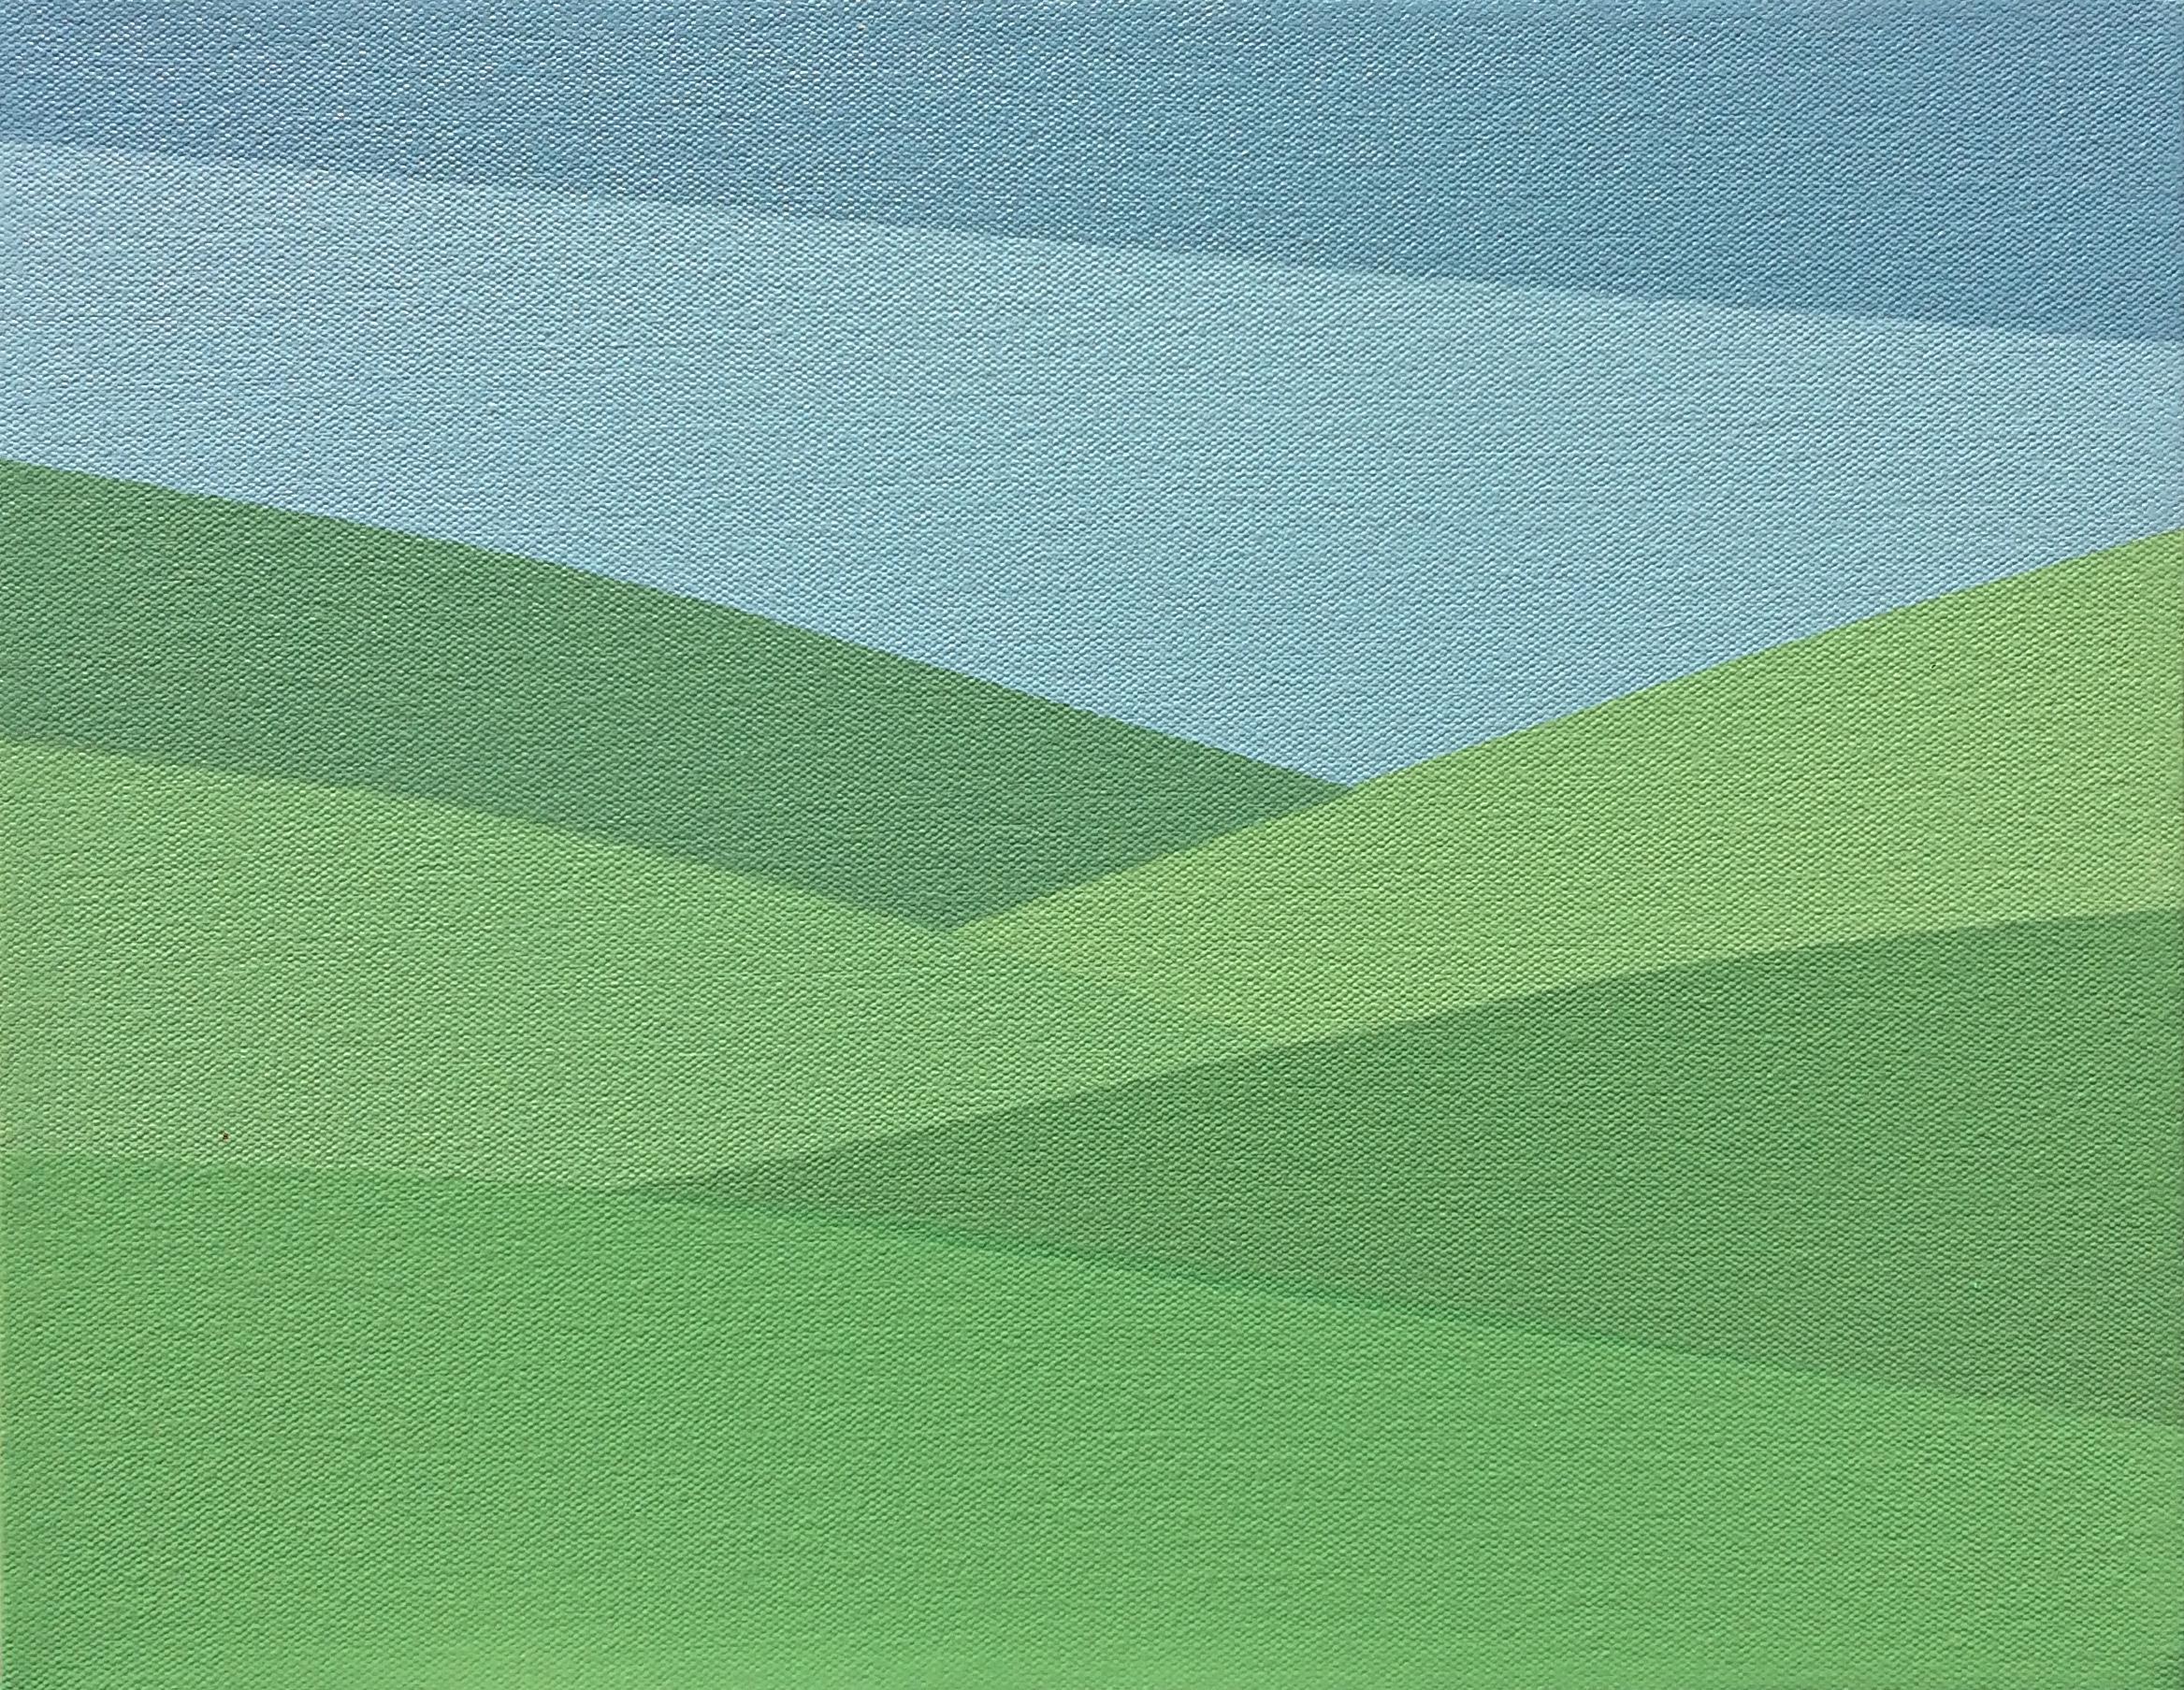 "Pasture, 2016, 11"" X 14"", Acrylic on canvas."